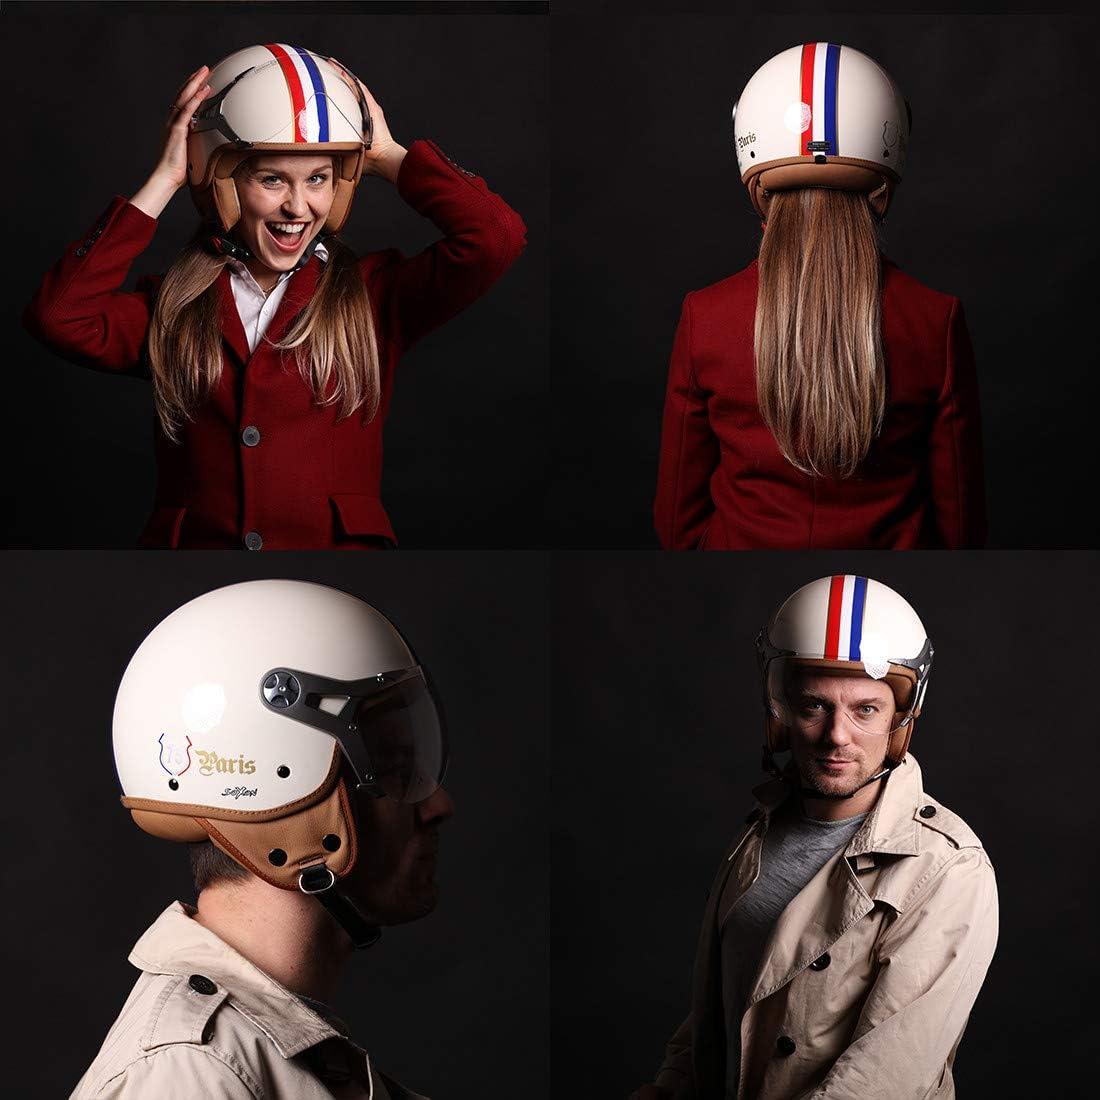 Visor /· incl Cloth Bag /· Beige /·  M SOXON SP-325 Paris /· Scooter-Helmet Bobber Moto-Helmet Pilot Cruiser Mofa Biker Jet-Helmet Retro Chopper Vintage Vespa-Helmet /· ECE certified /· incl 57-58cm